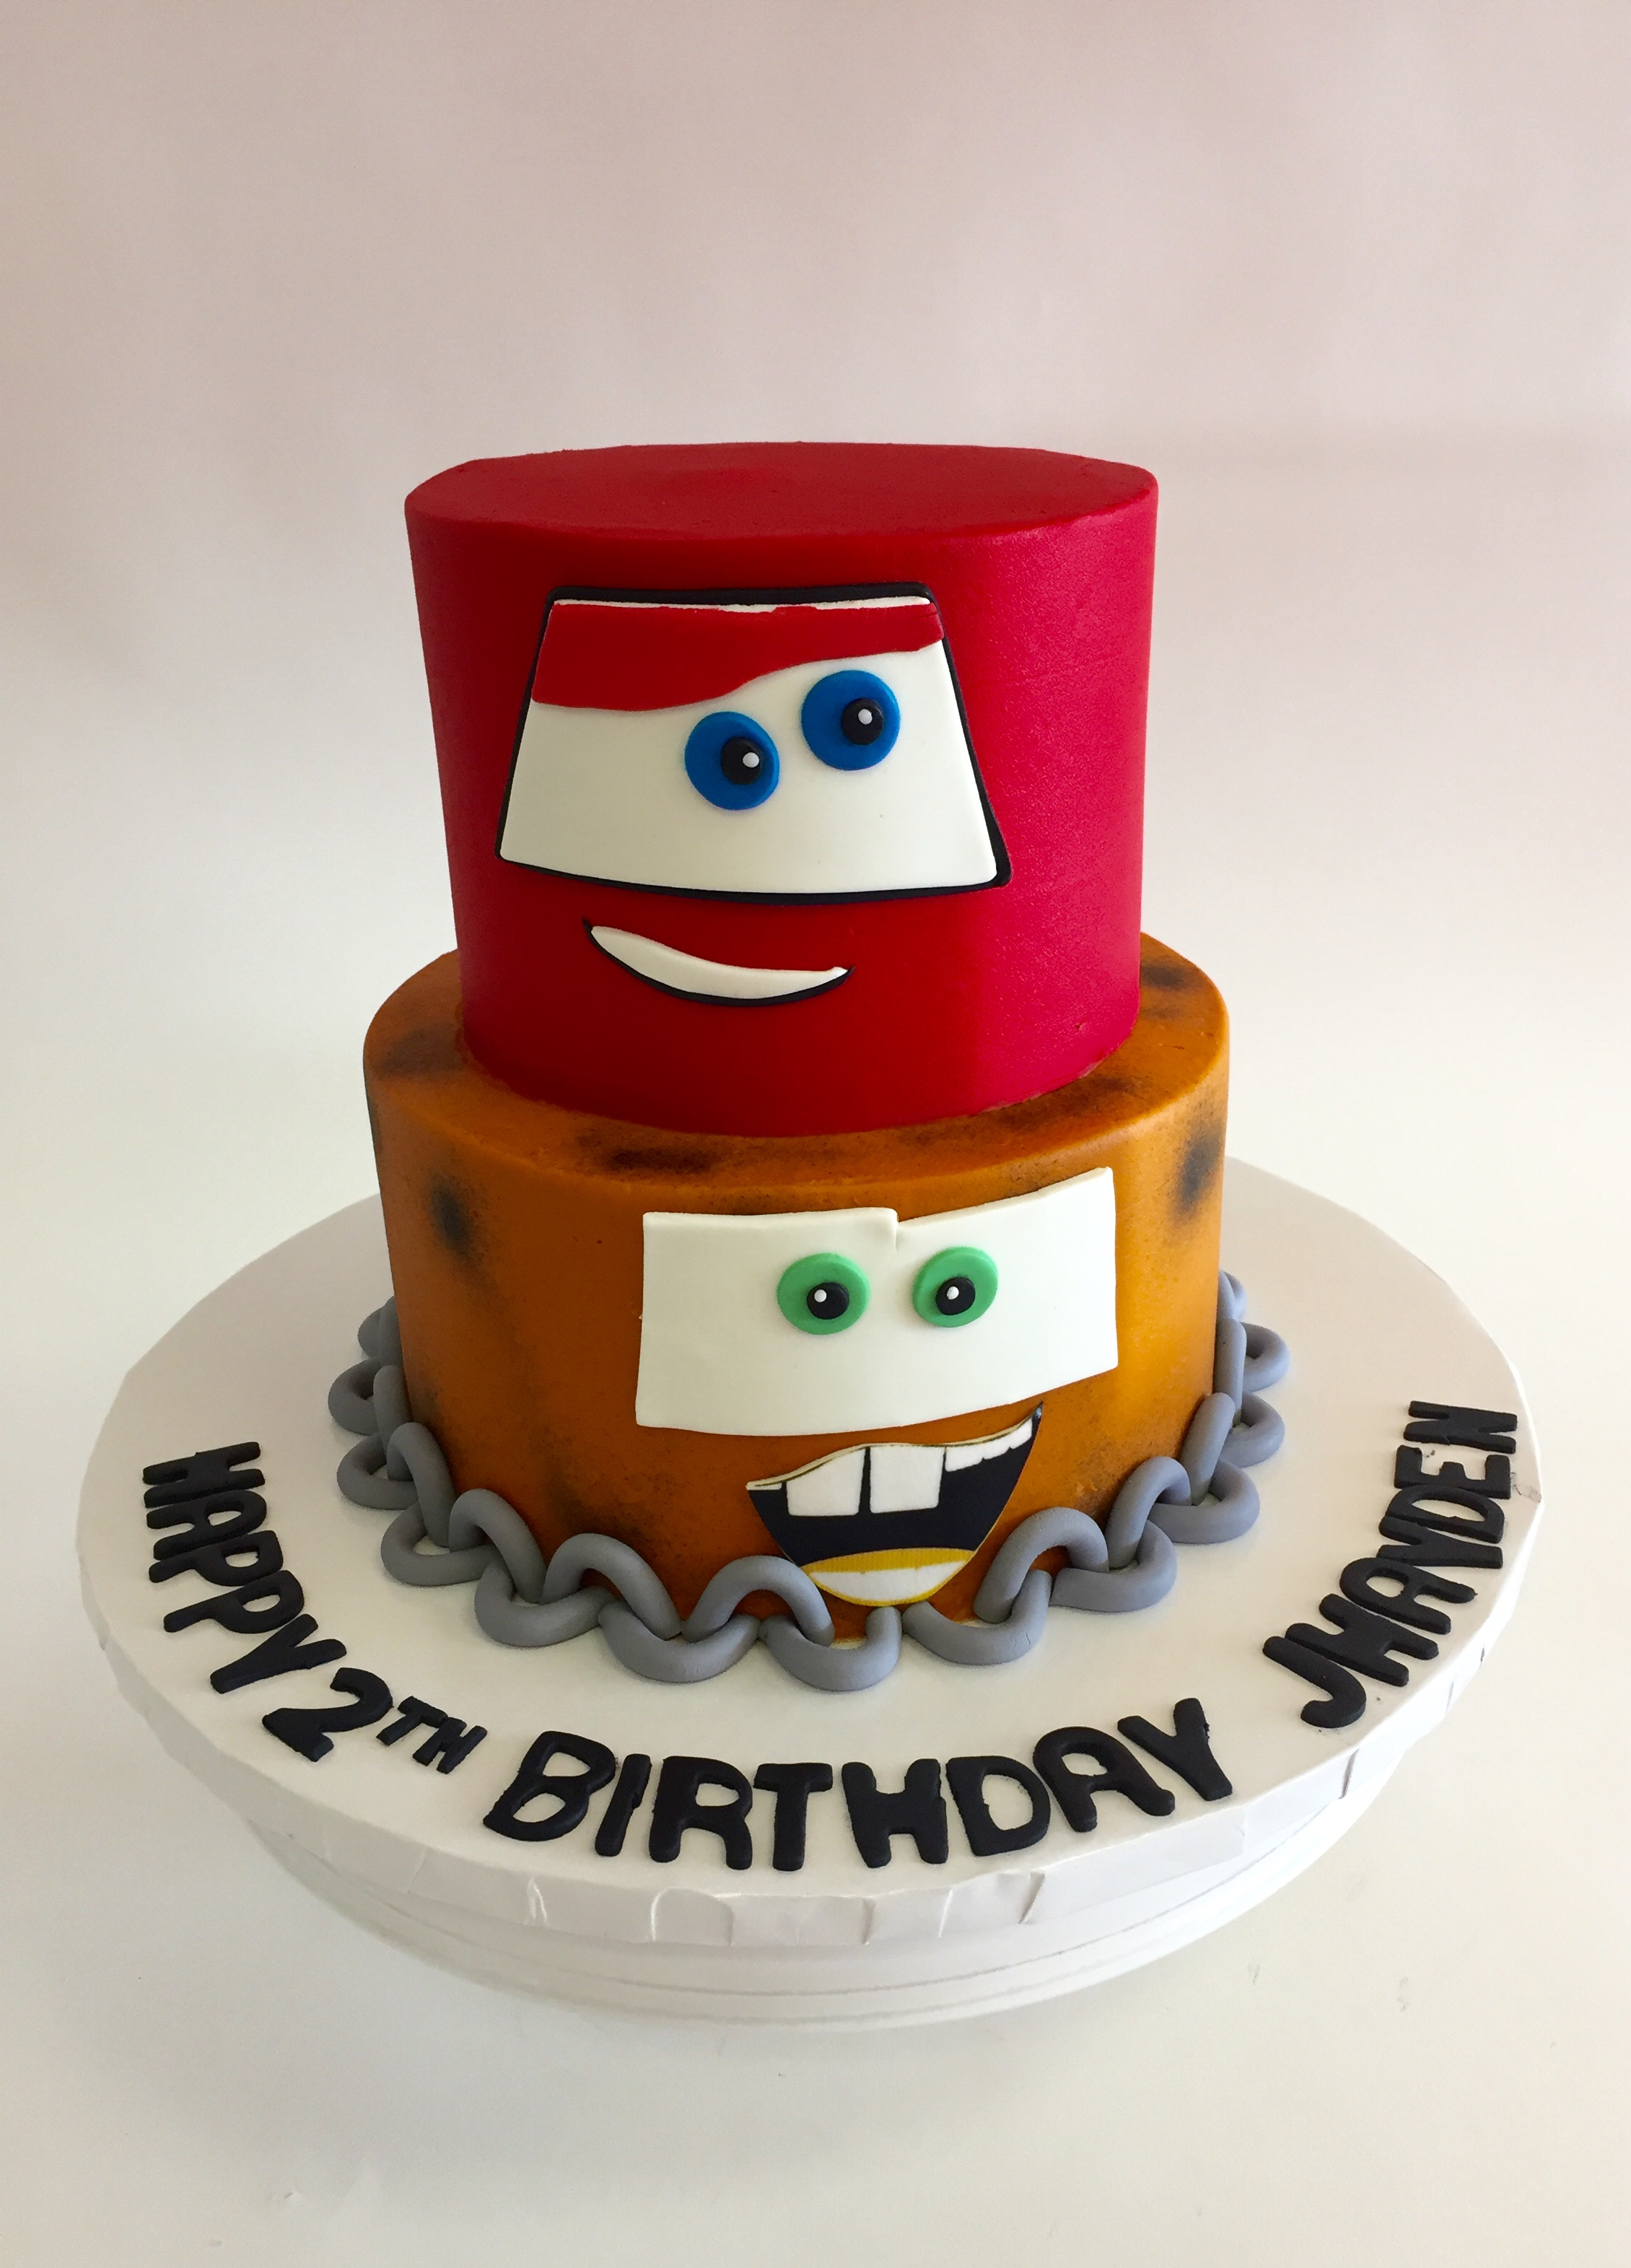 Nancys Cake Designs Boys Birthday Cakes File Oct 11 1 16 38 PM